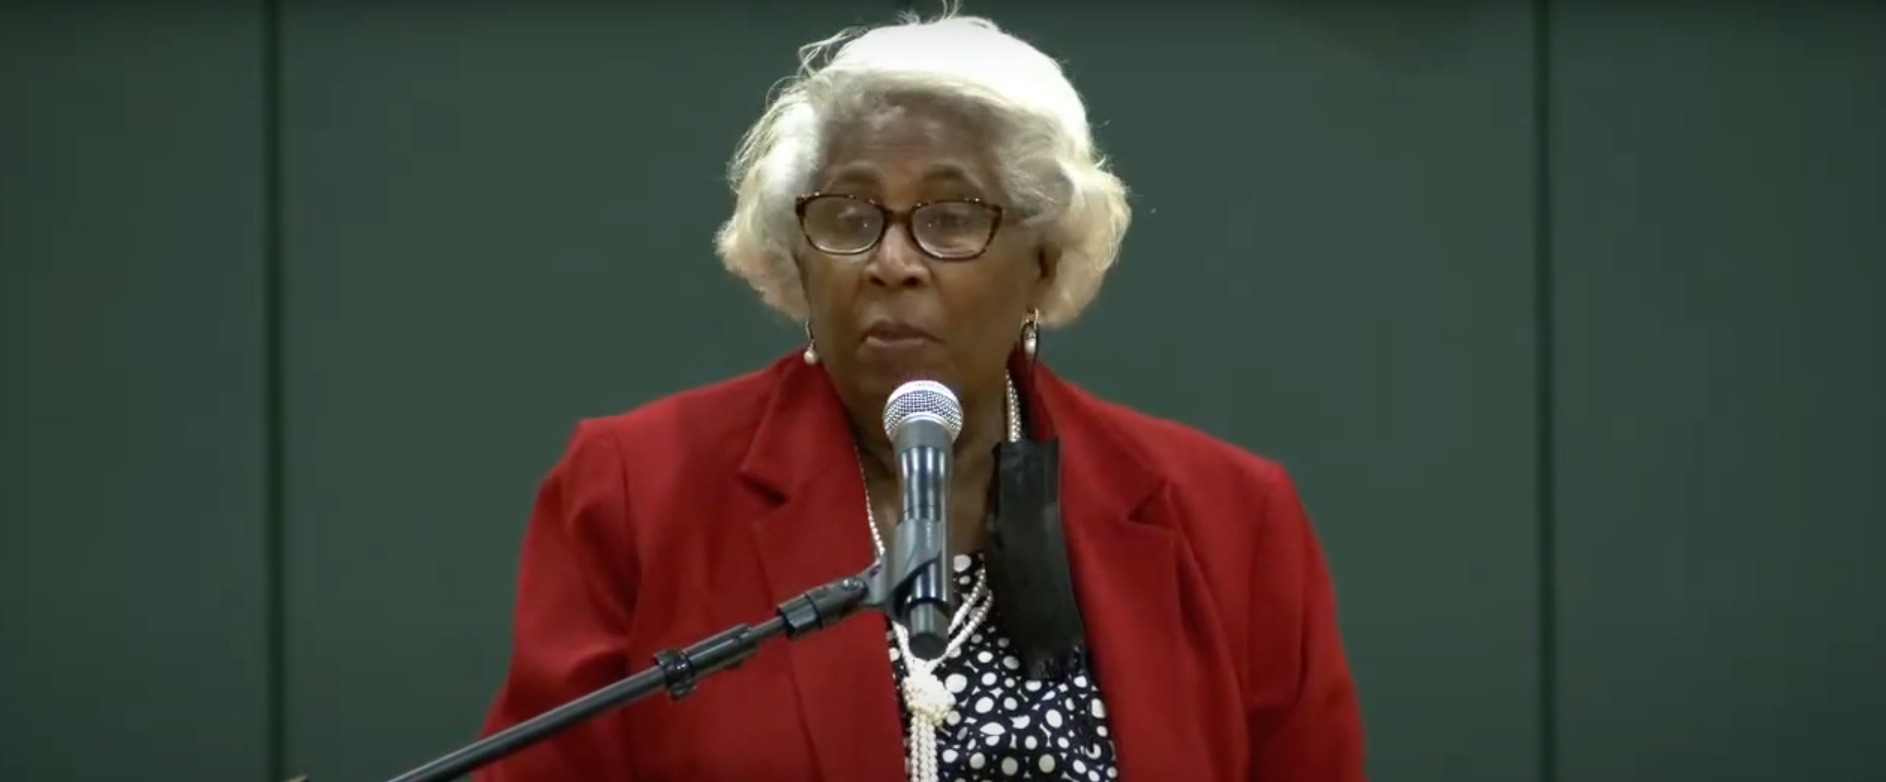 Bishop of Charleston v. Adams challenges South Carolina's racist Blaine Amendment